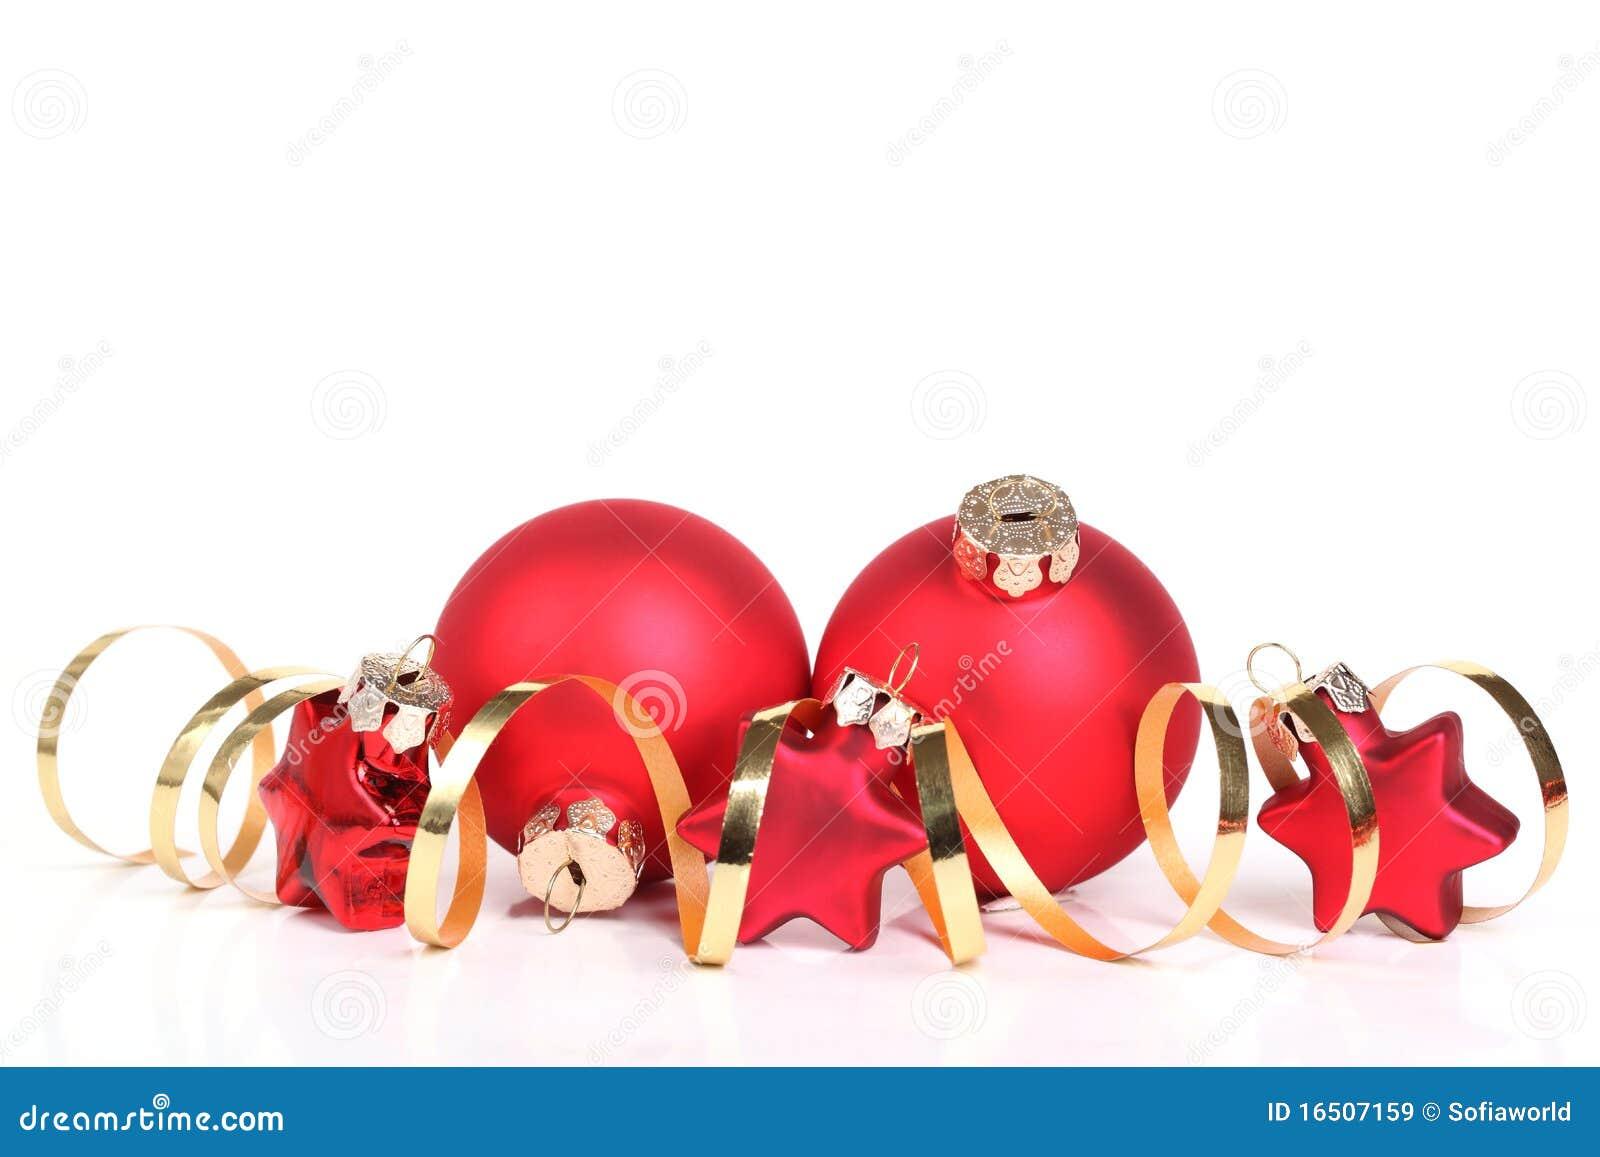 #C30821 Christmas Decoration Royalty Free Stock Images Image  6361 décoration noel commerce 1300x957 px @ aertt.com